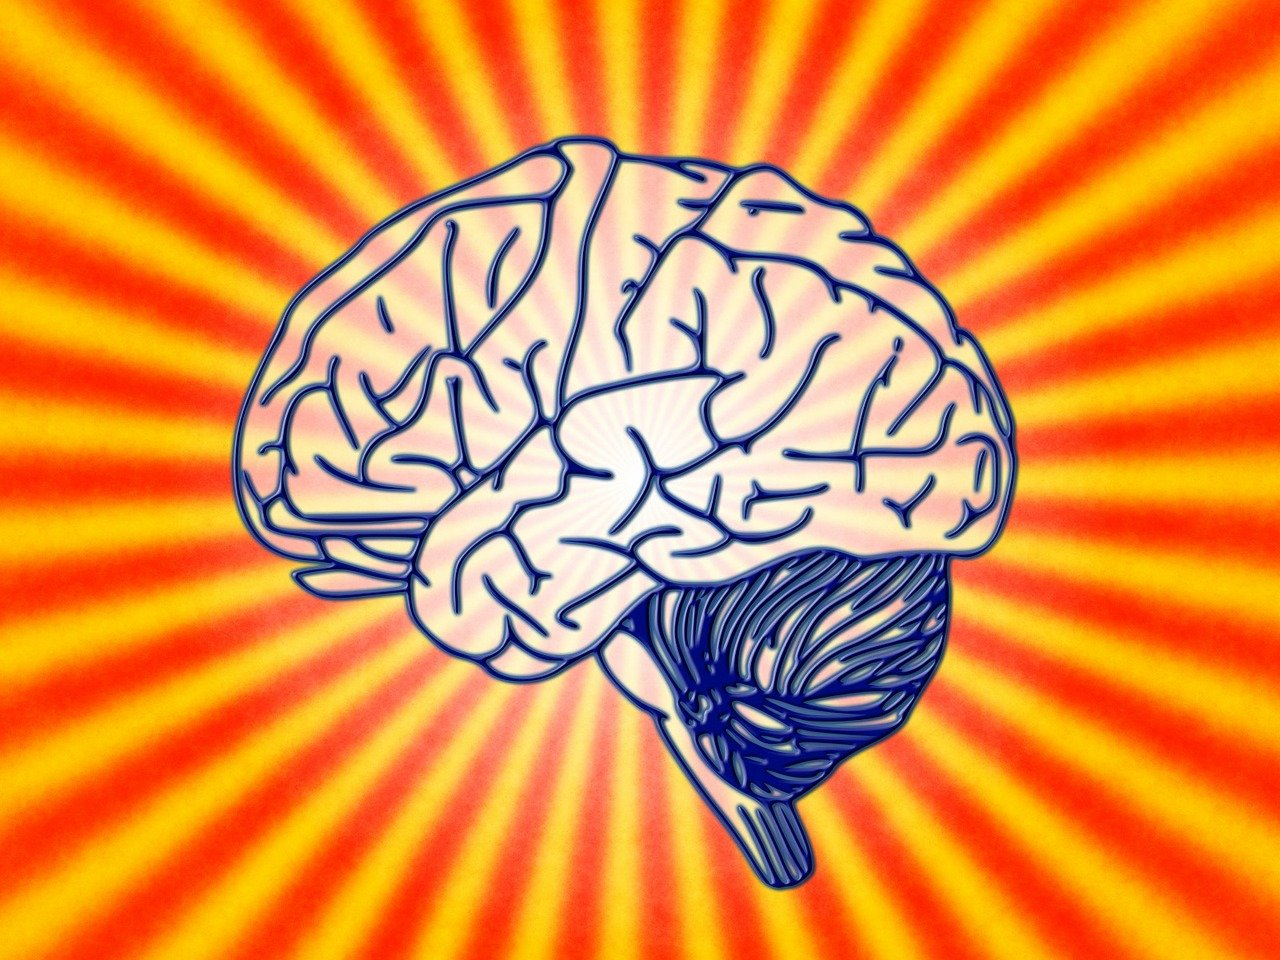 brainwave research